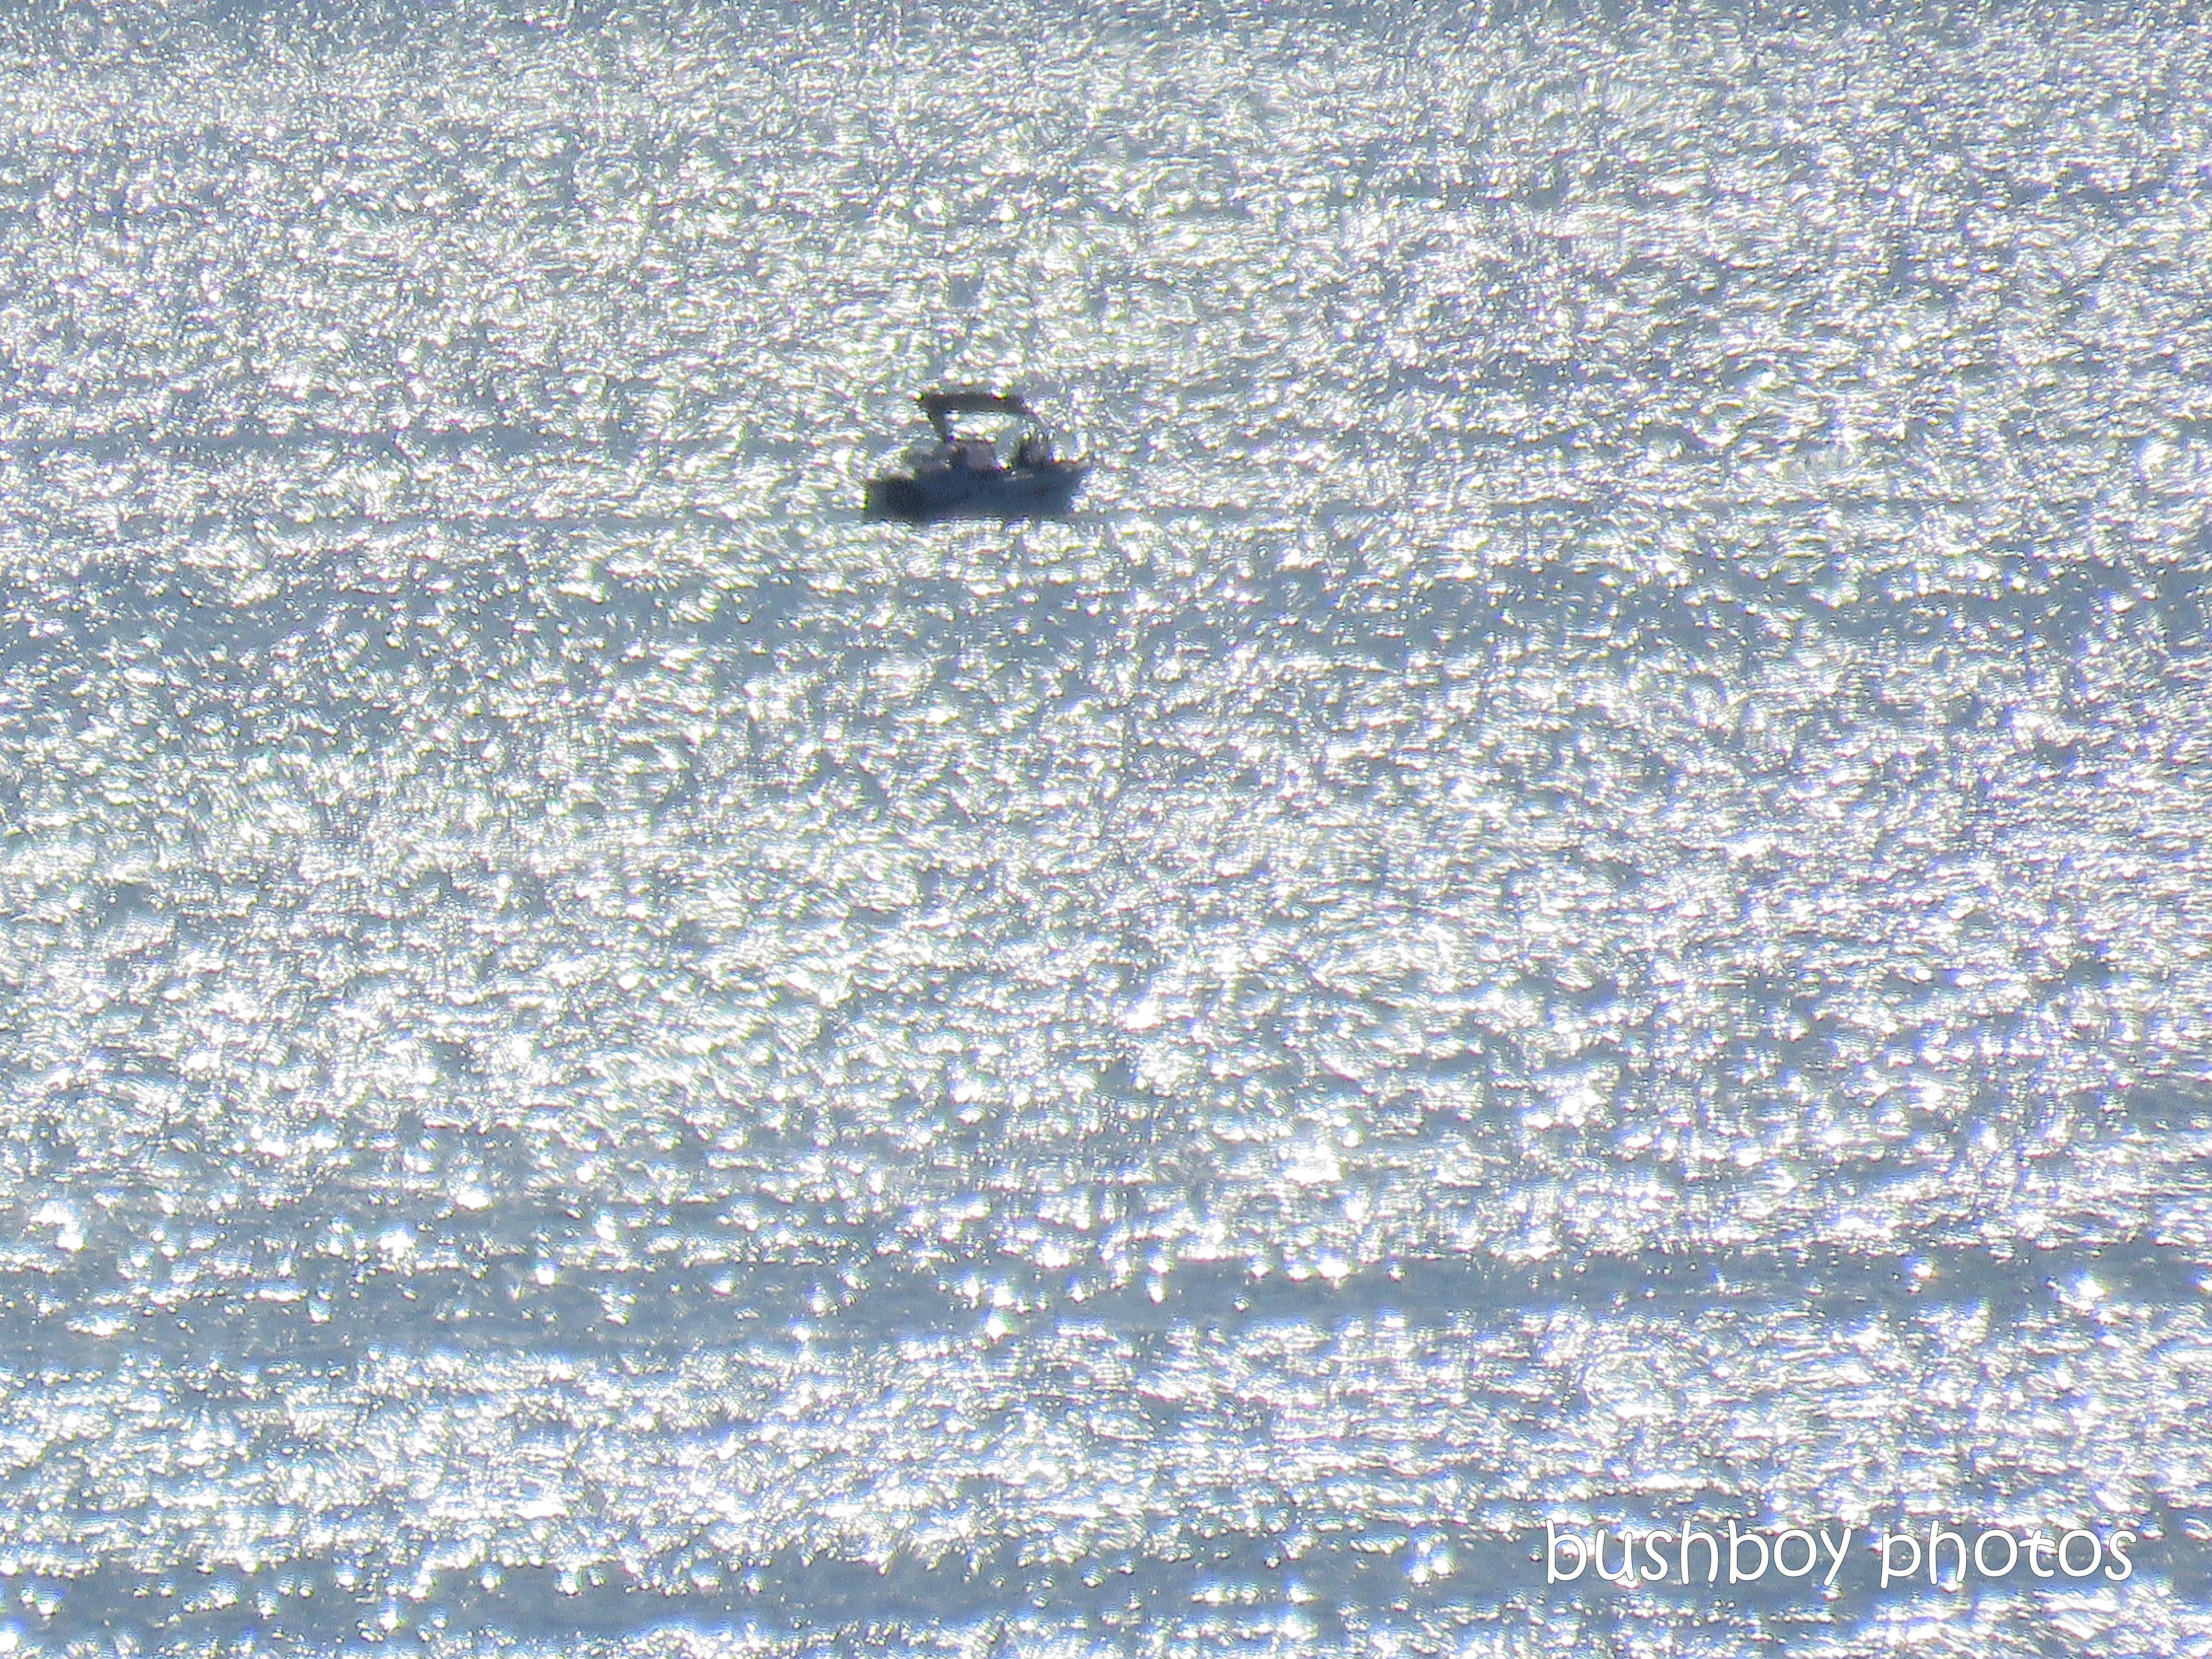 190410_blog_challenge_dazzle_boat_water_port_stephens